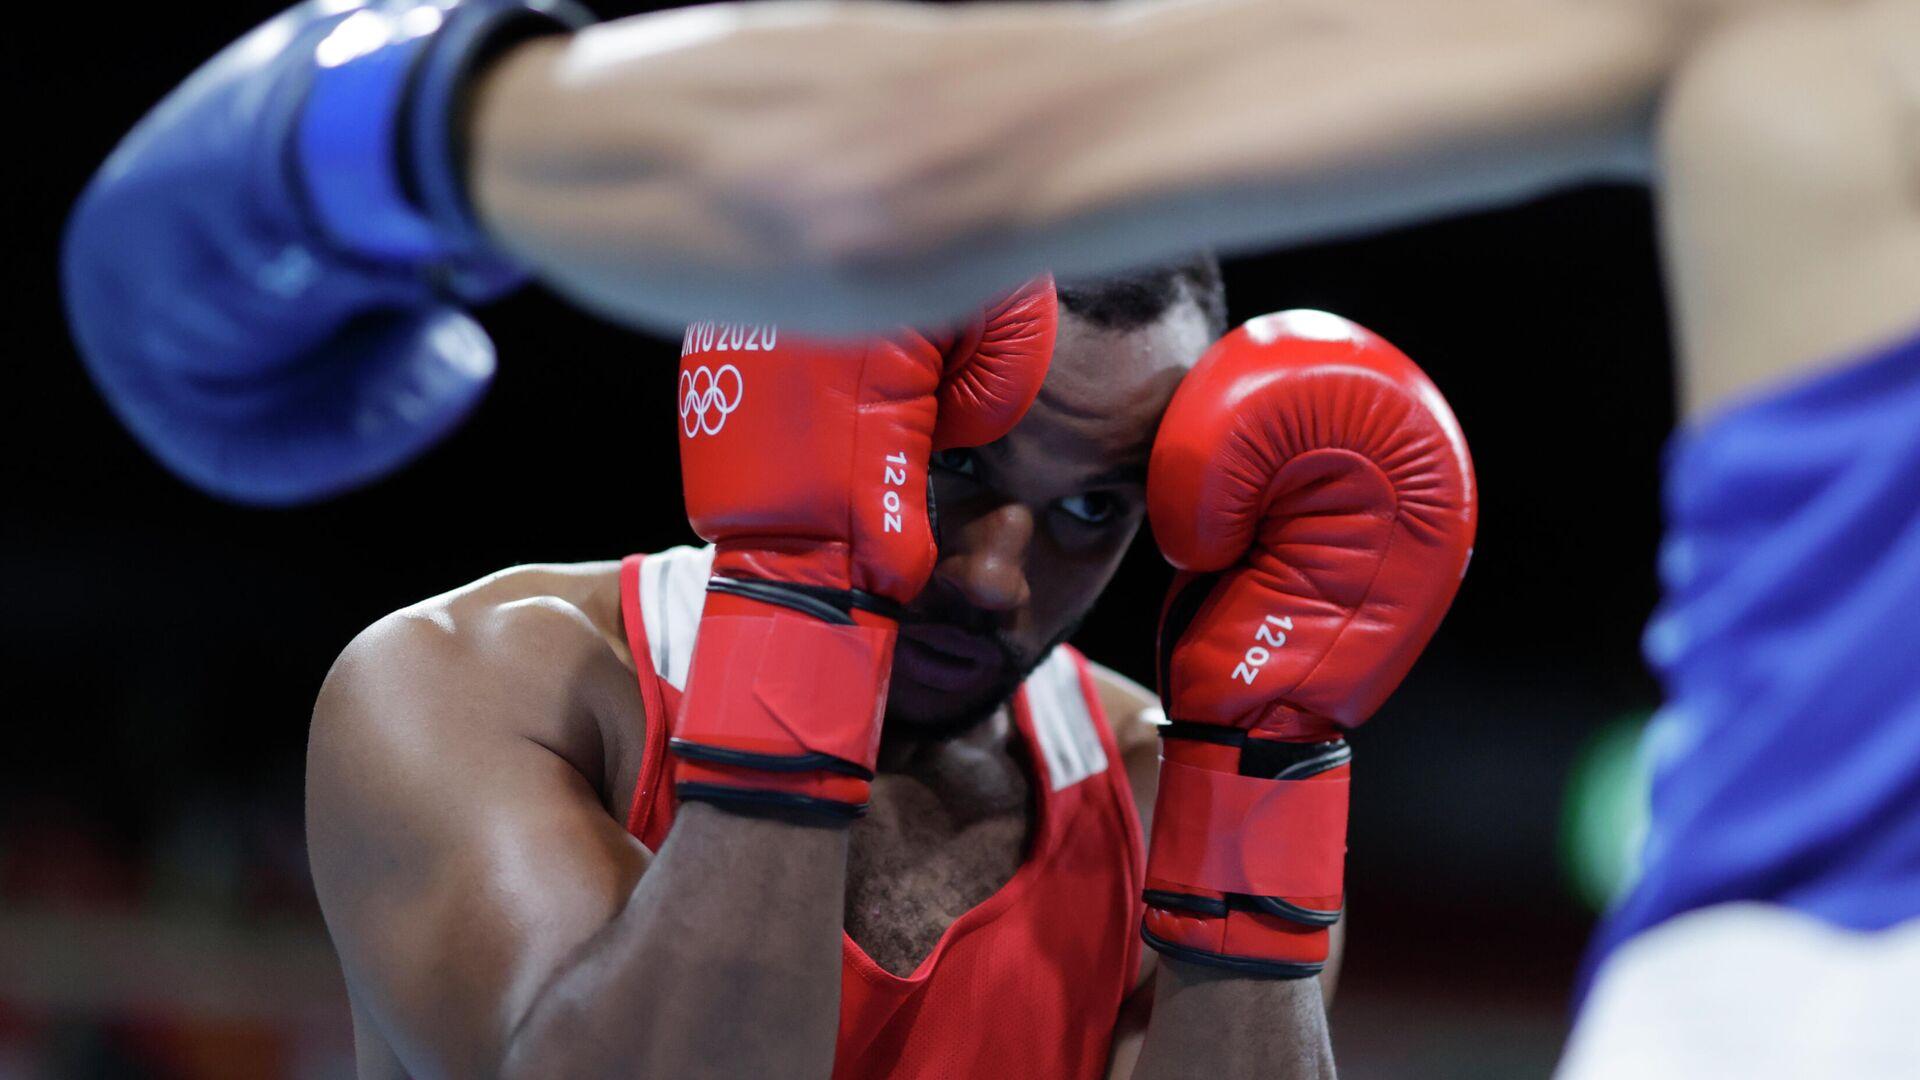 Марокканский боксер Юнес Баала на Олимпиаде в Токио - РИА Новости, 1920, 27.07.2021